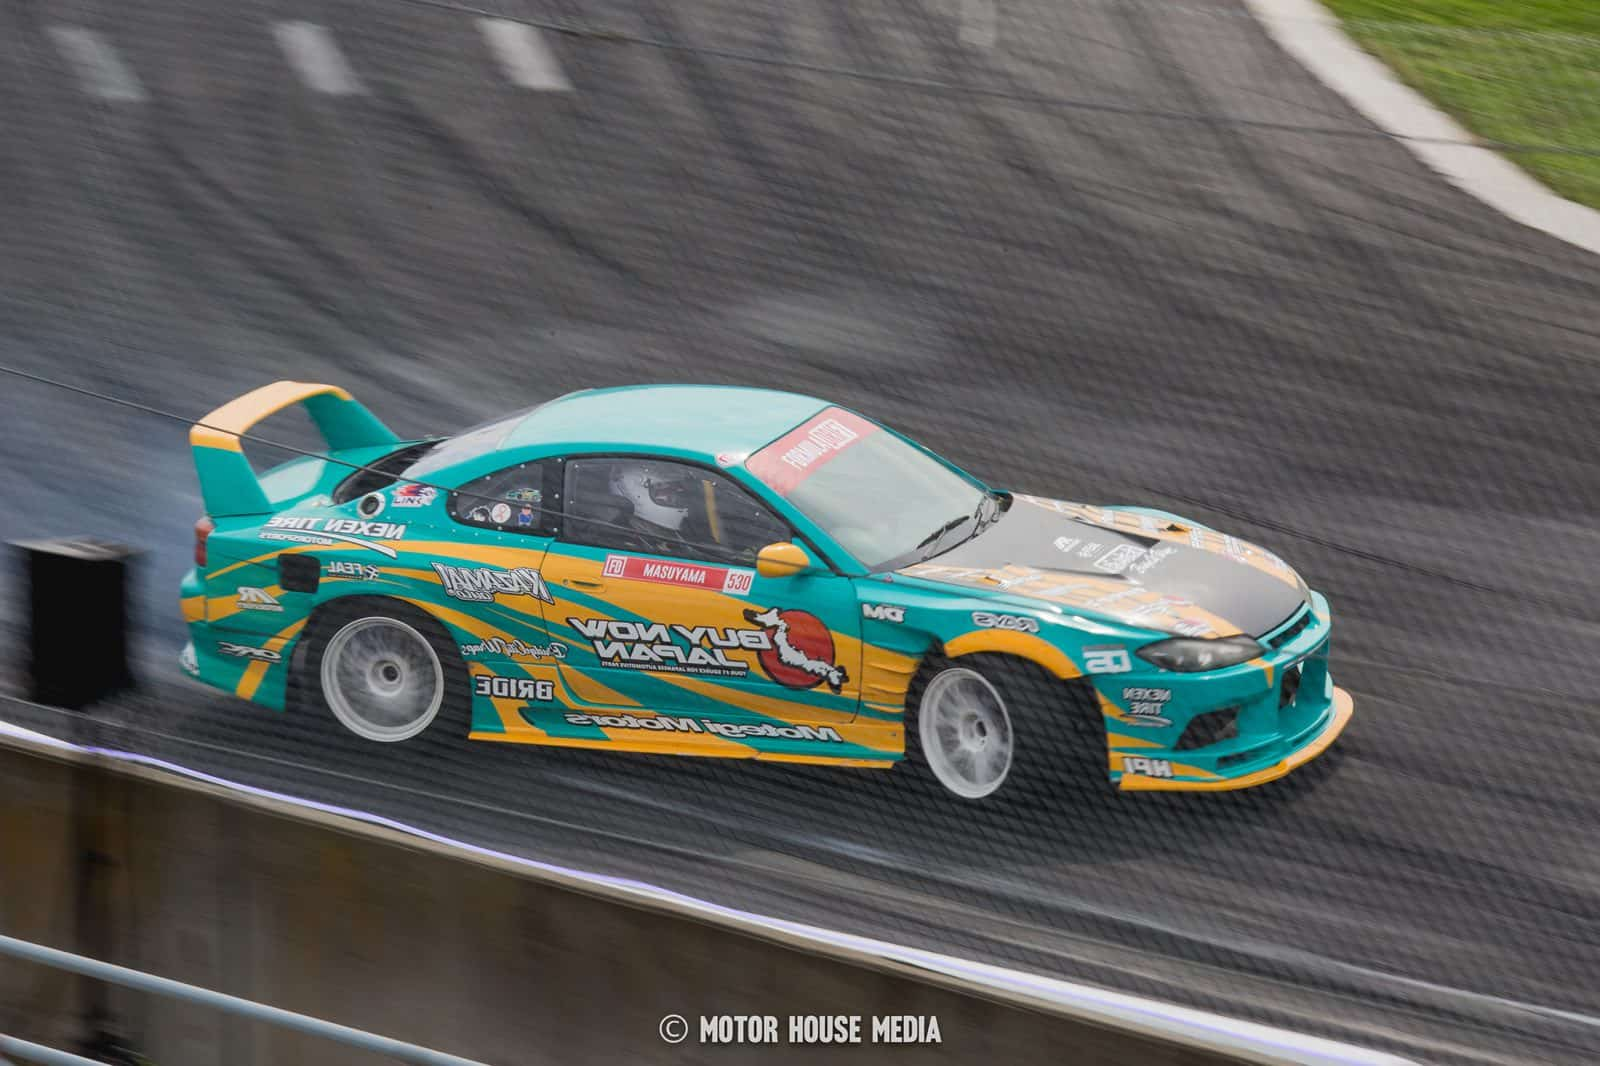 Mataru Masuyama drifting in his Buy Japan Formula drift car